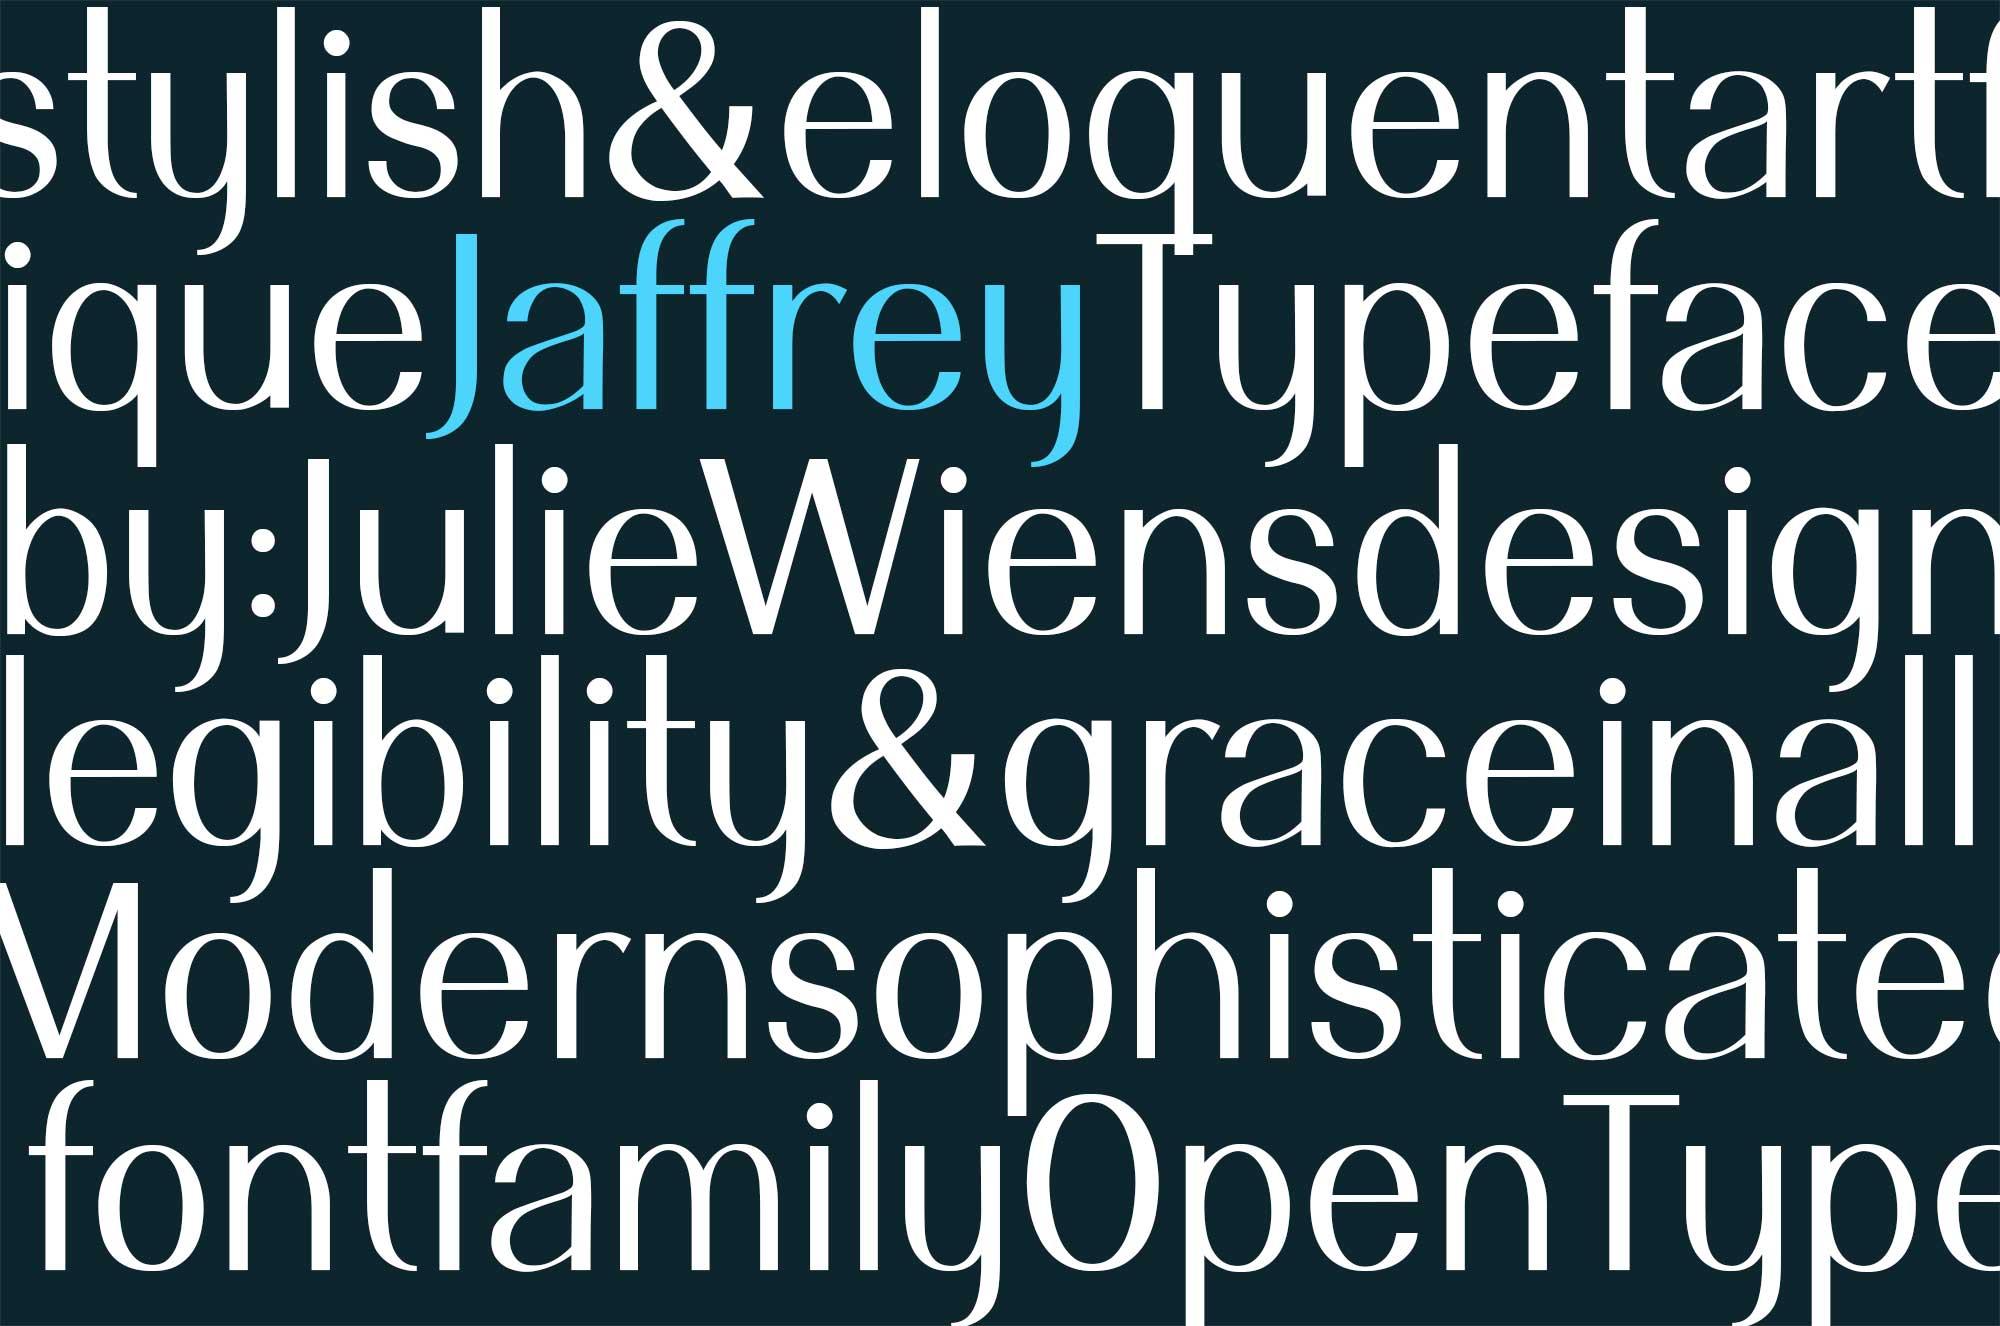 Jaffrey3-1.jpg